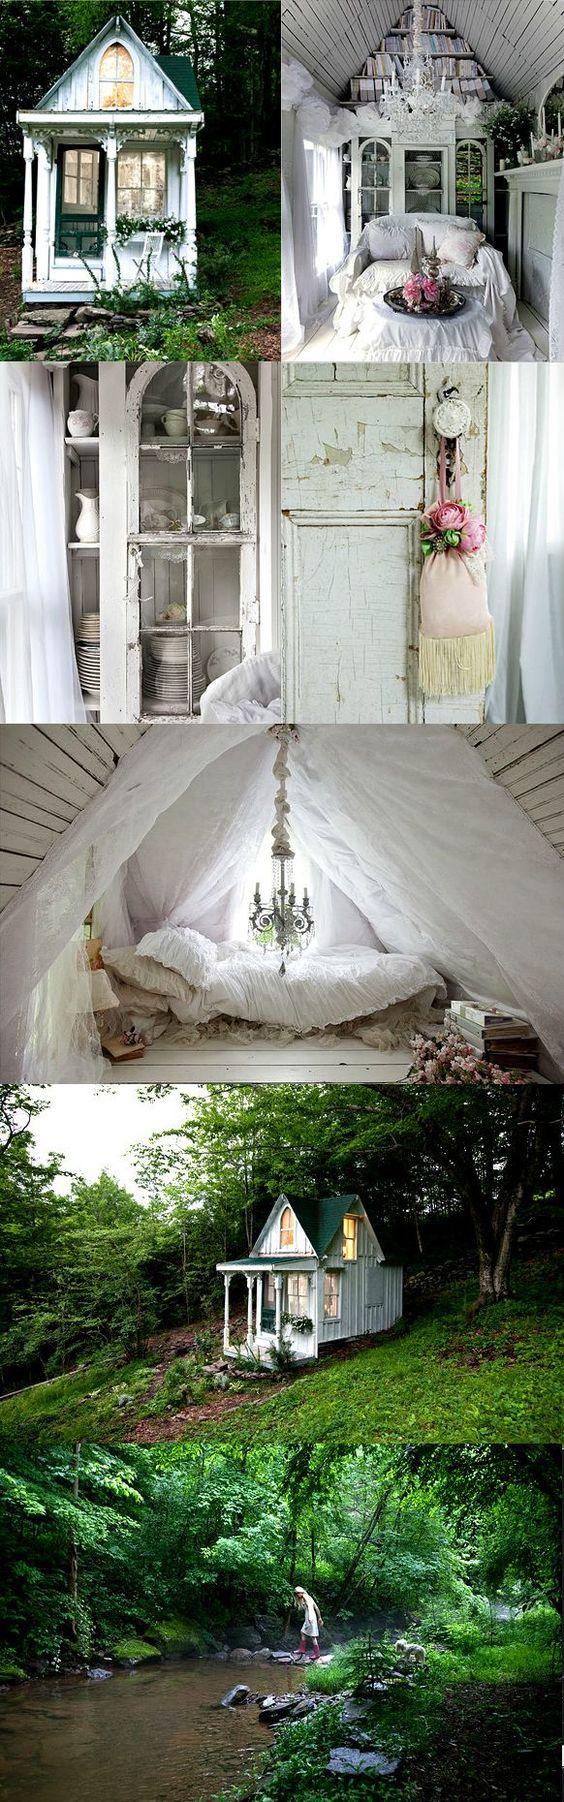 Alice in Wonderland Cottage